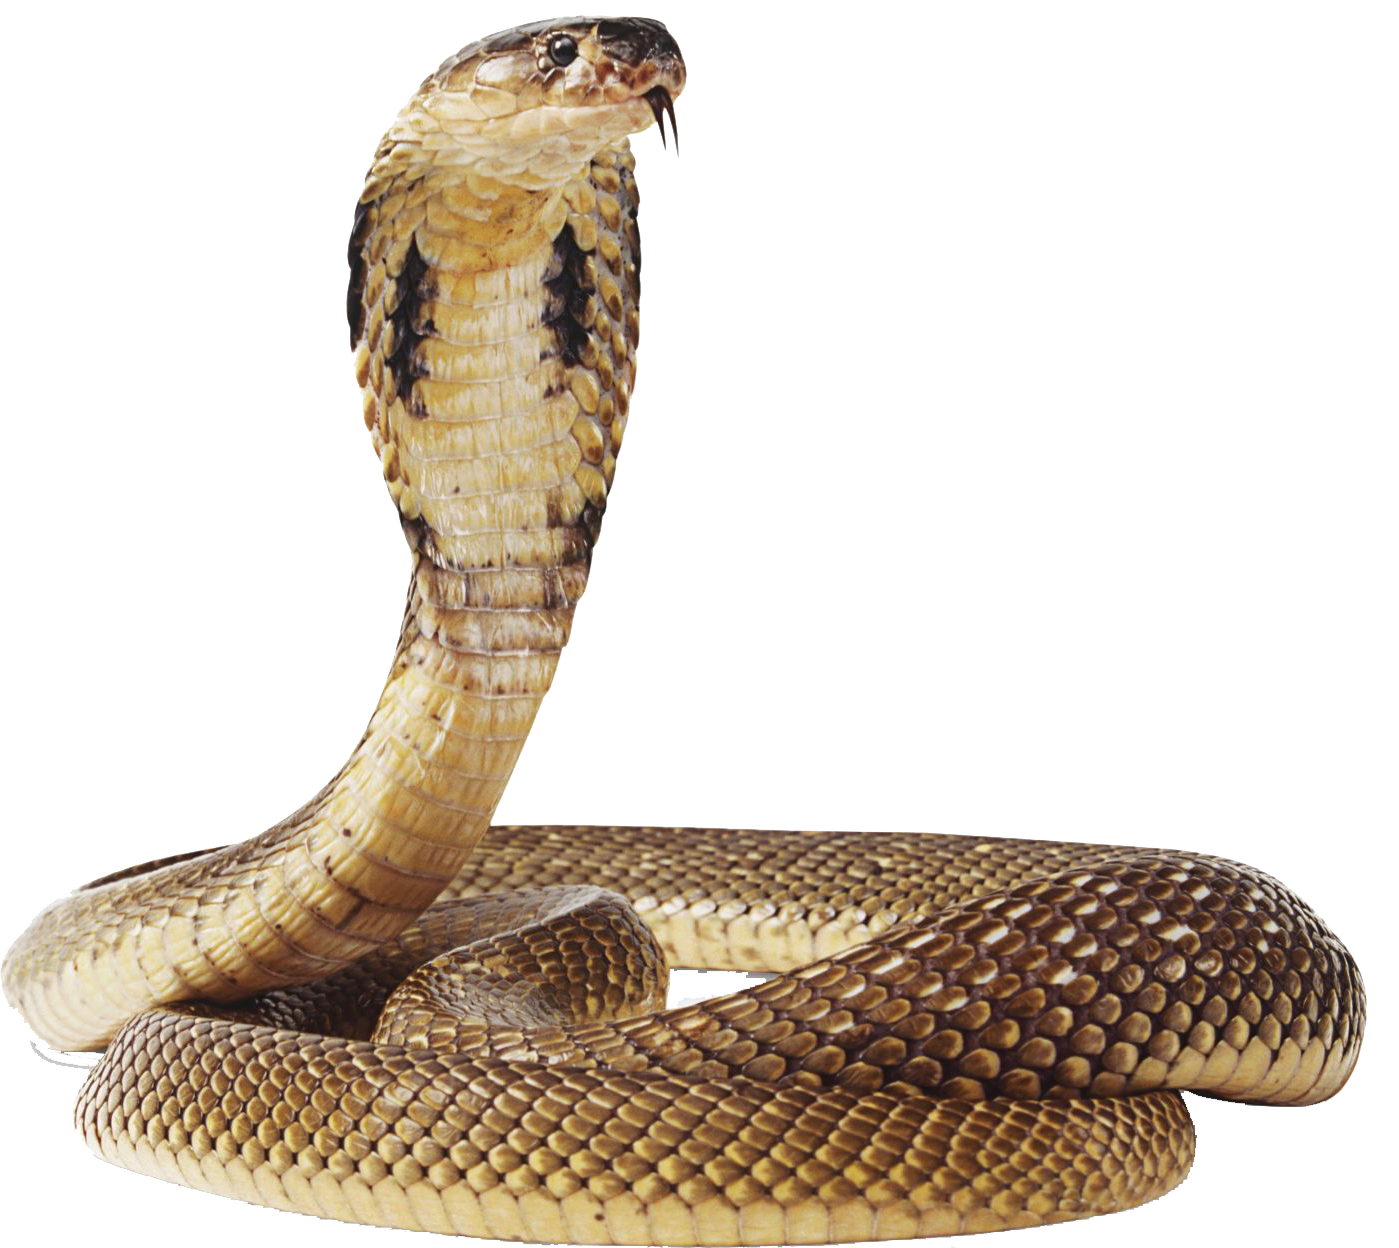 Cobra clipart coiled snake. Image result for snakes